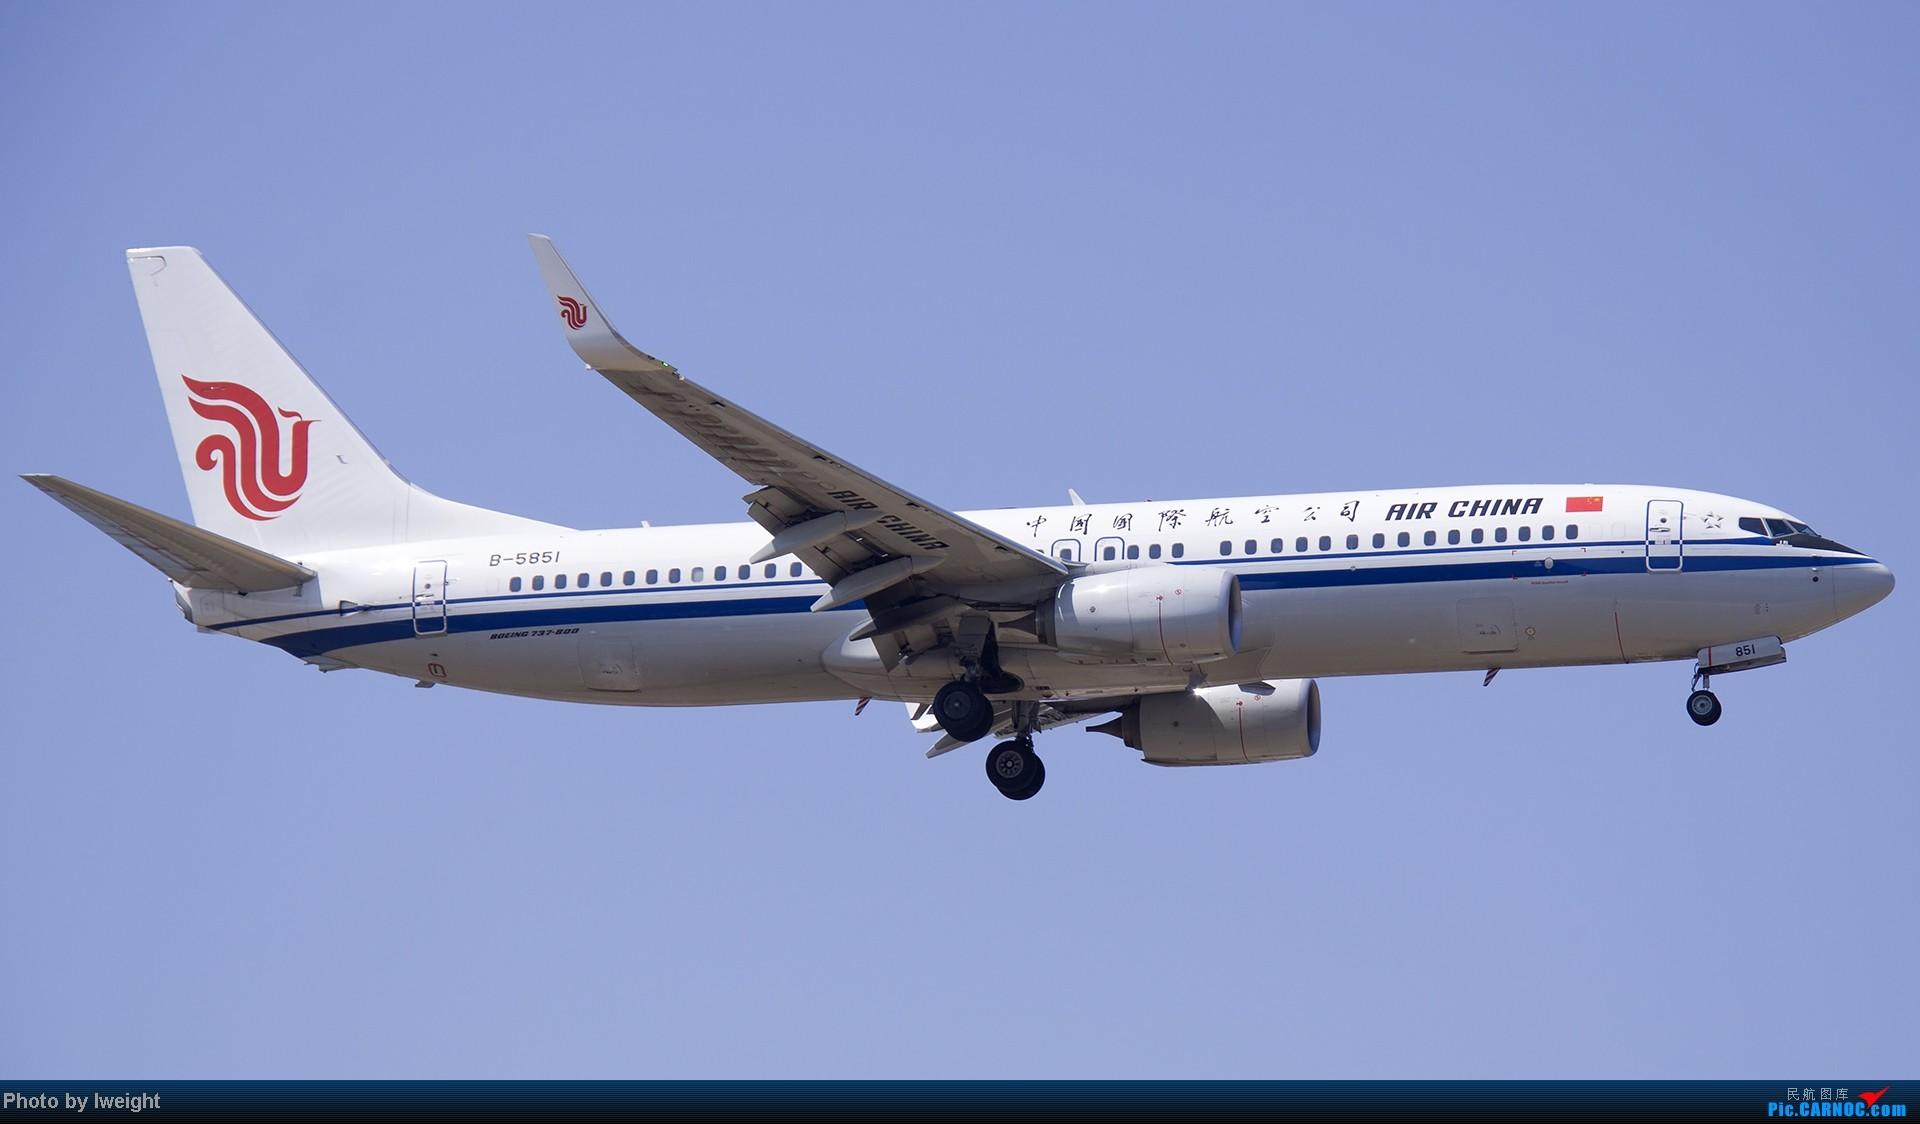 Re:[原创]北京难得的好天气,收获多种机型和彩绘,遗憾的是再次错过卡航巴塞罗那彩绘 BOEING 737-800 B-5851 中国北京首都机场